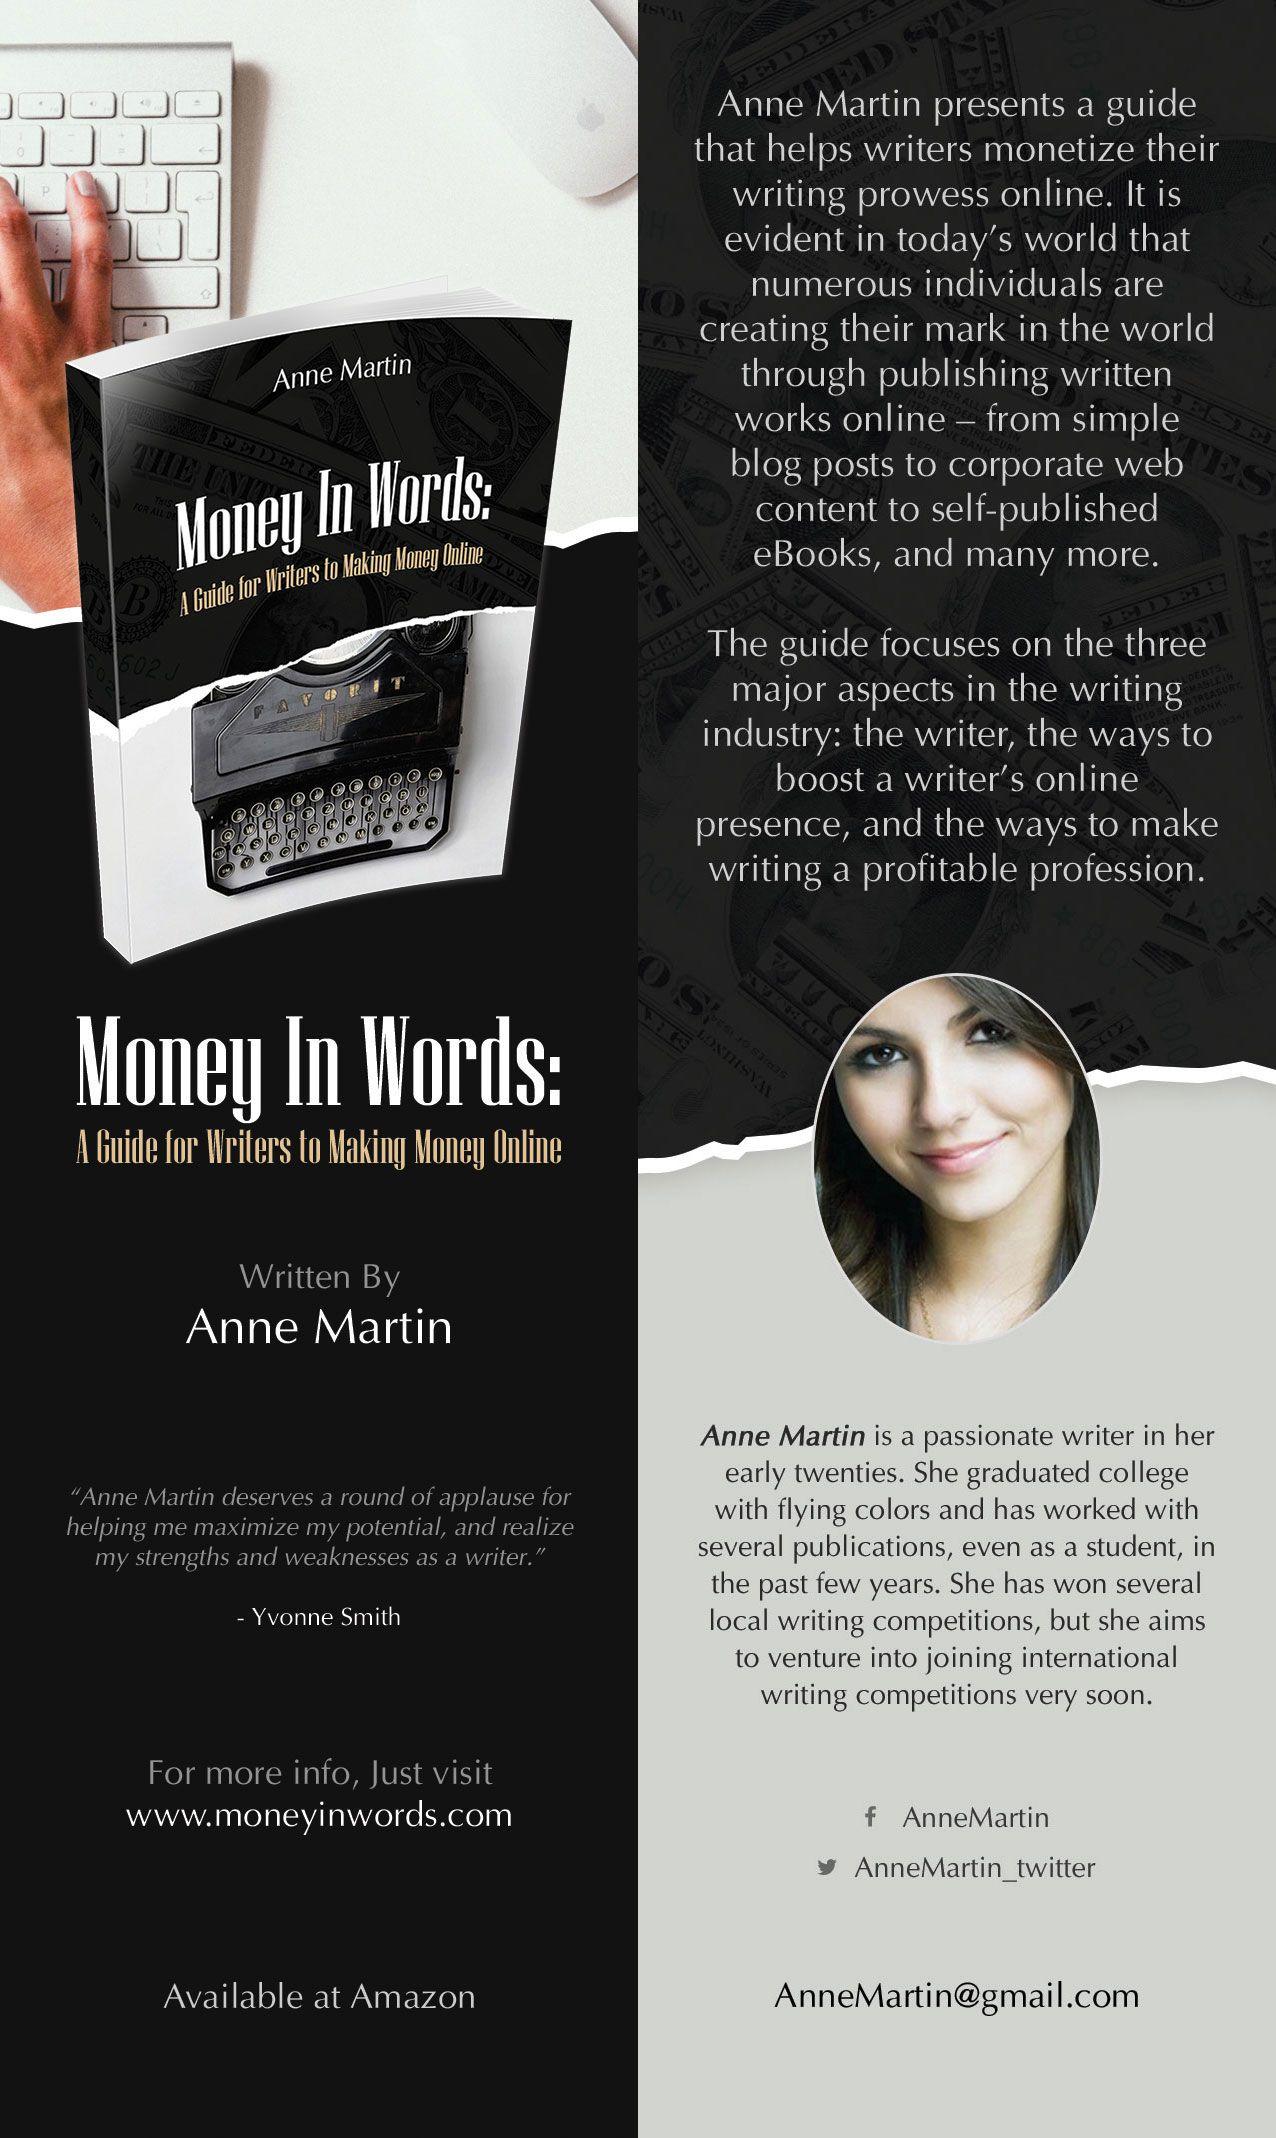 money in words book author bookmark bookmark author books book